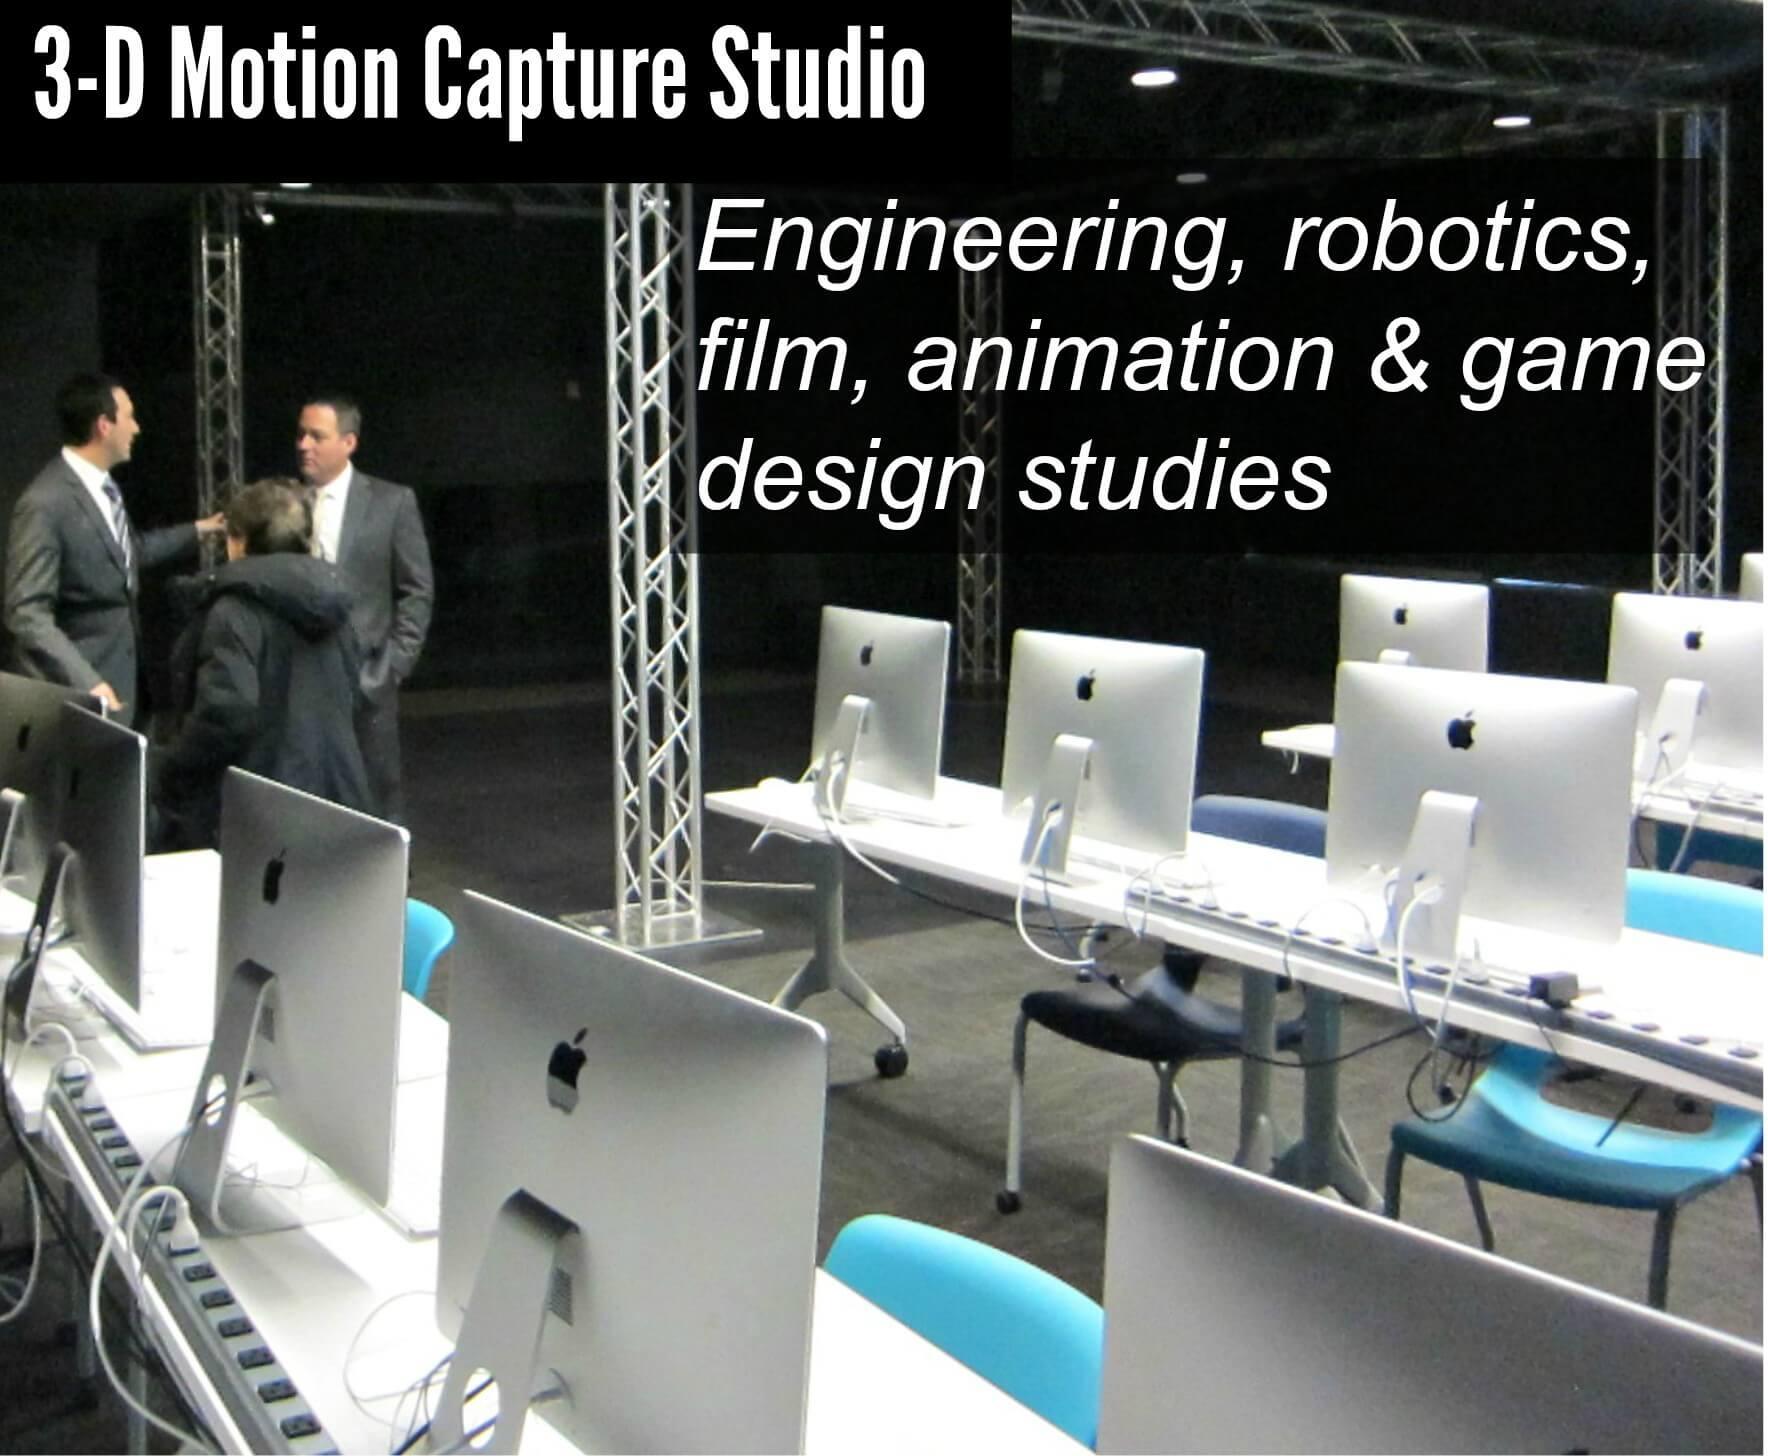 East Falls Local 1-12 motion capture studio text